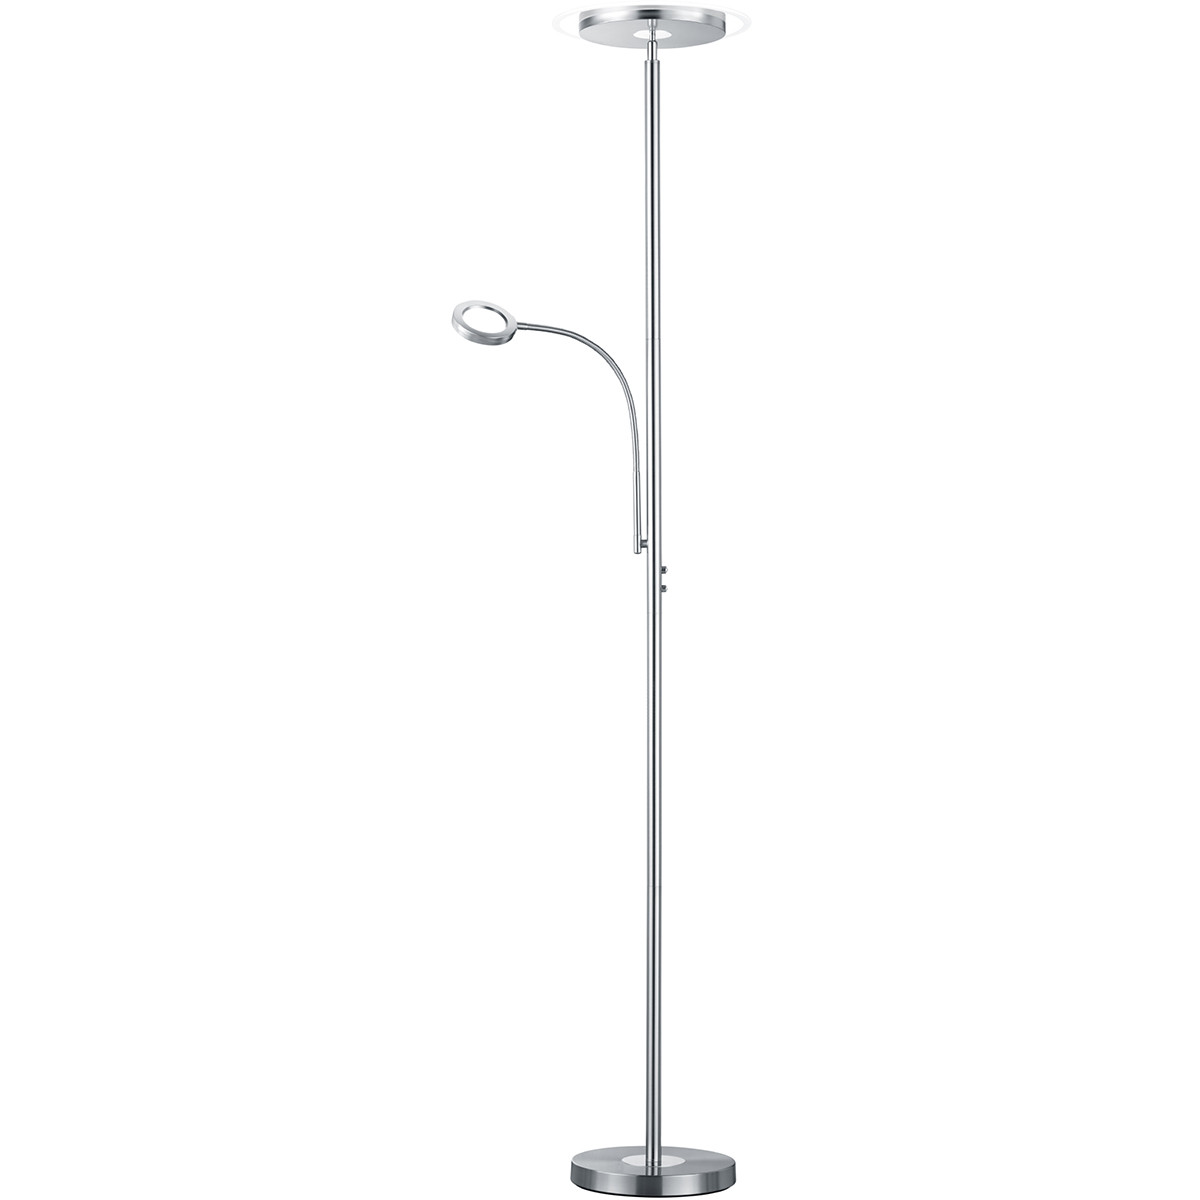 LED Vloerlamp - Trion Aciban - 18W + 4W - Warm Wit 3000K - 2-lichts - Dimbaar - Rond - Mat Nikkel -